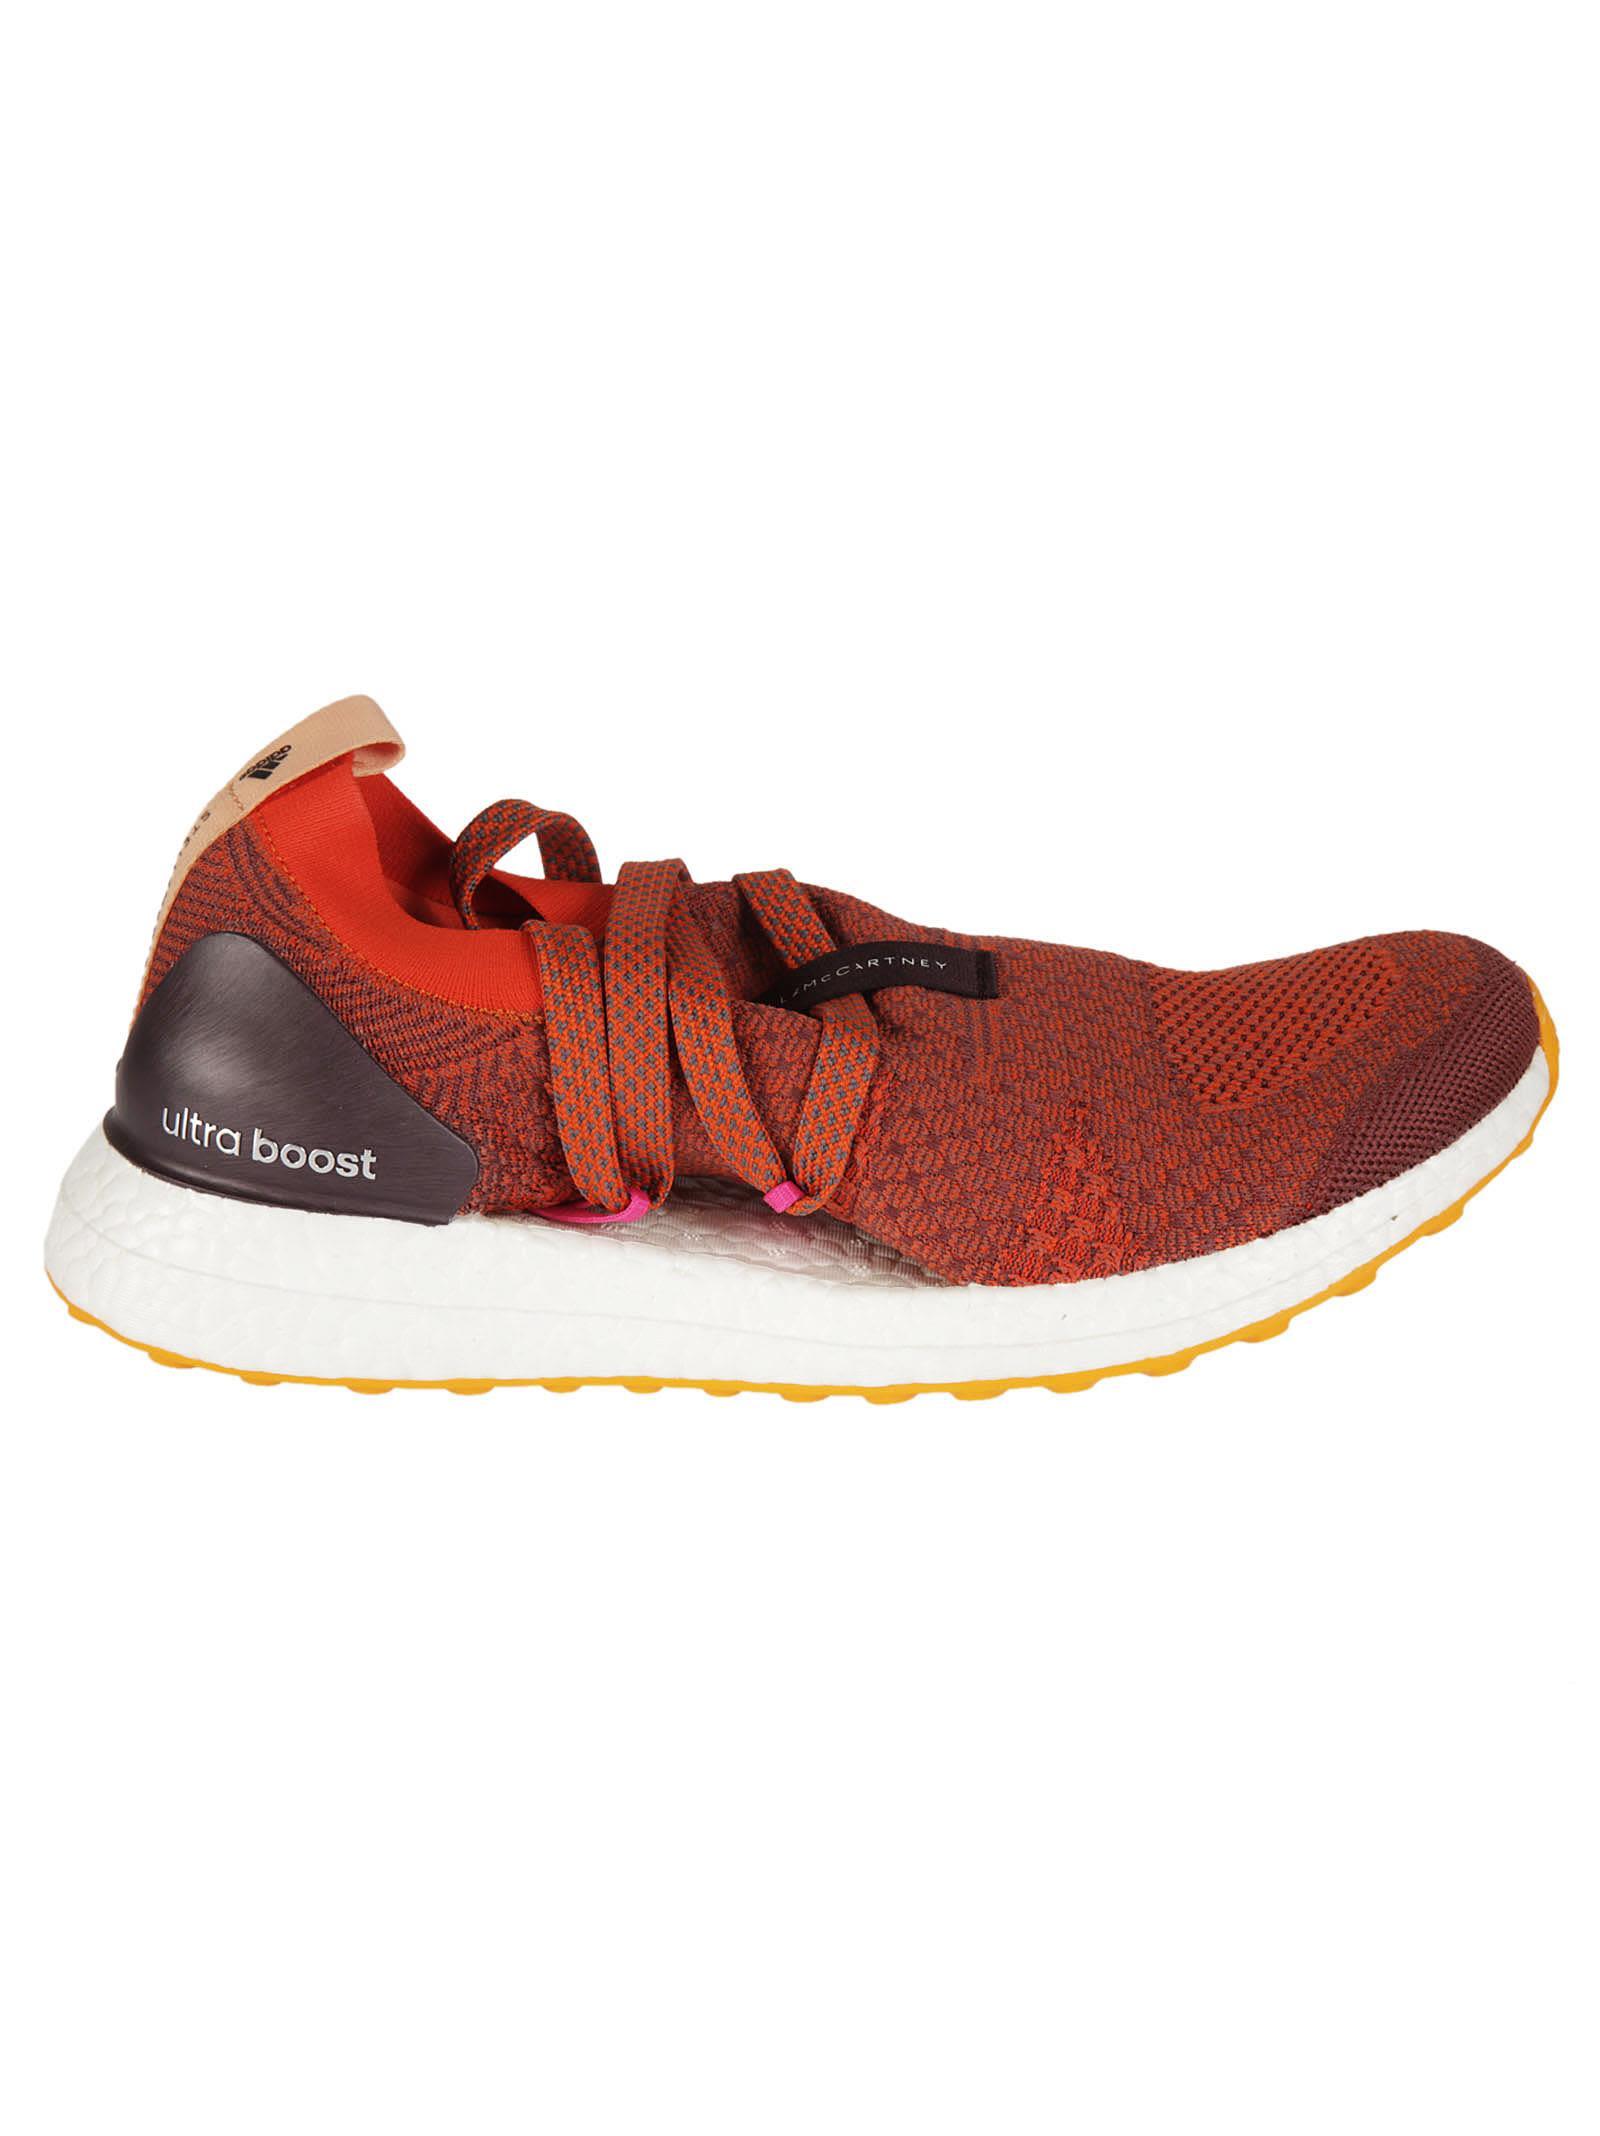 Ultraboost X Parley Running Shoe Adidas